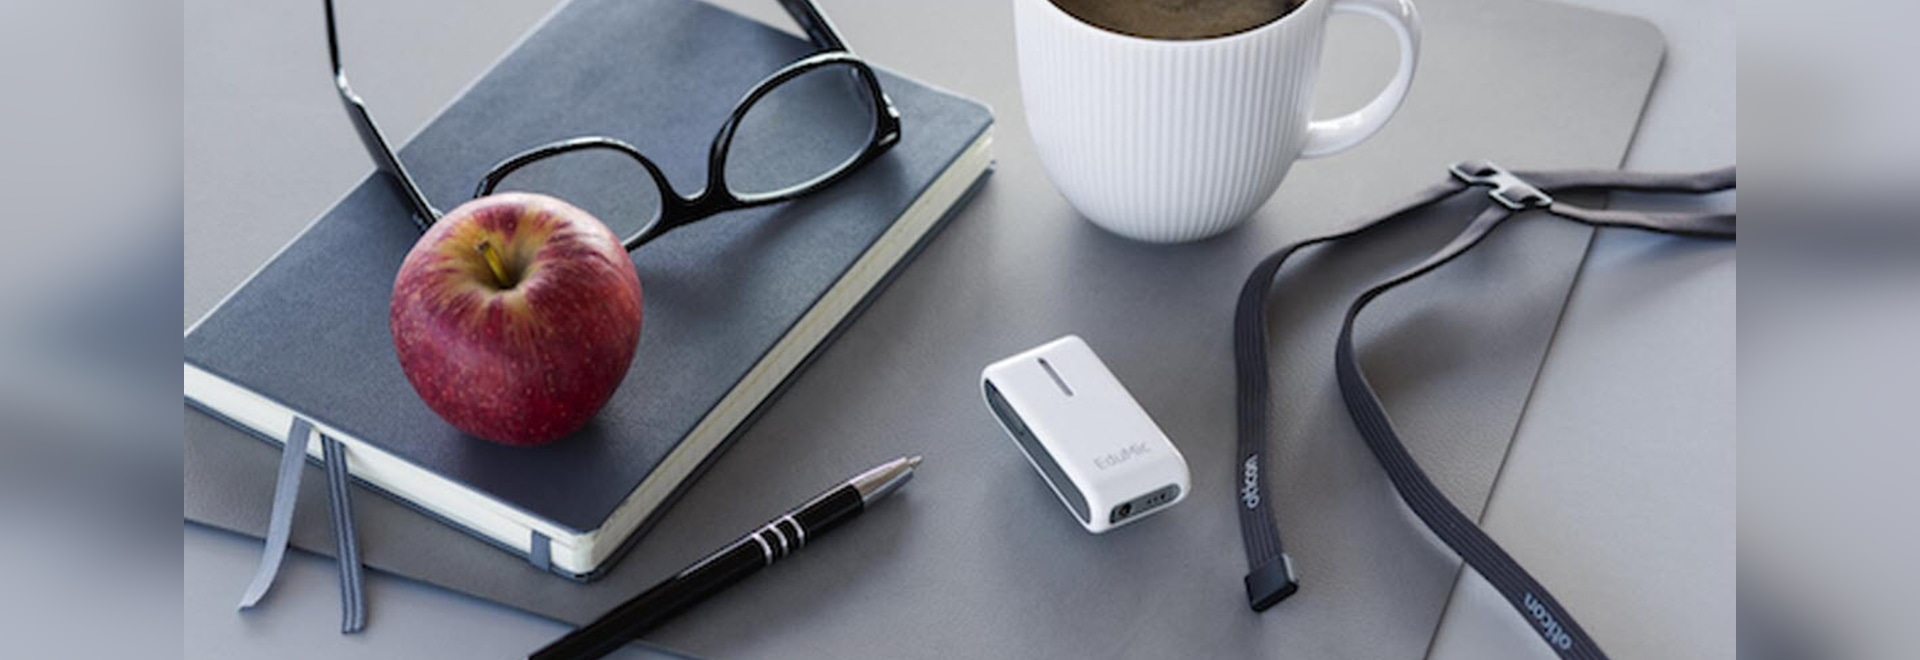 Oticon EduMic Wireless Remote Microphone System